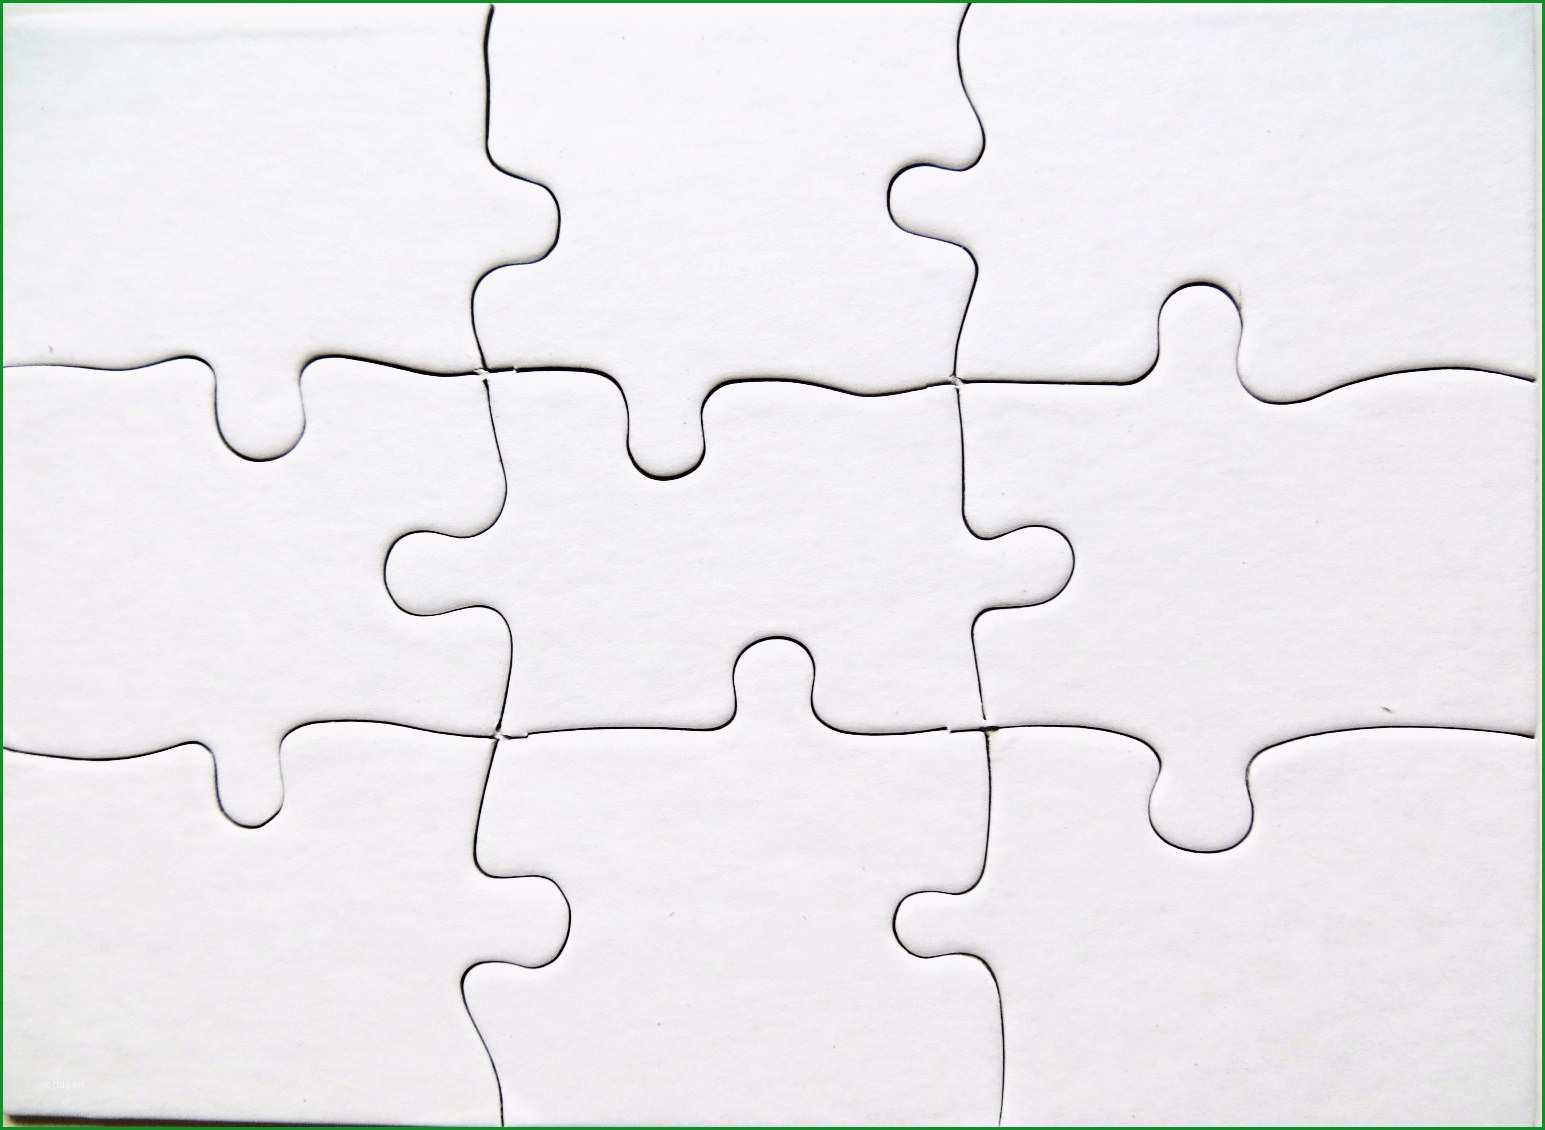 Beste Puzzle Vorlage Blanko Blanko Puzzle Din A4 3er Pack Puzzle